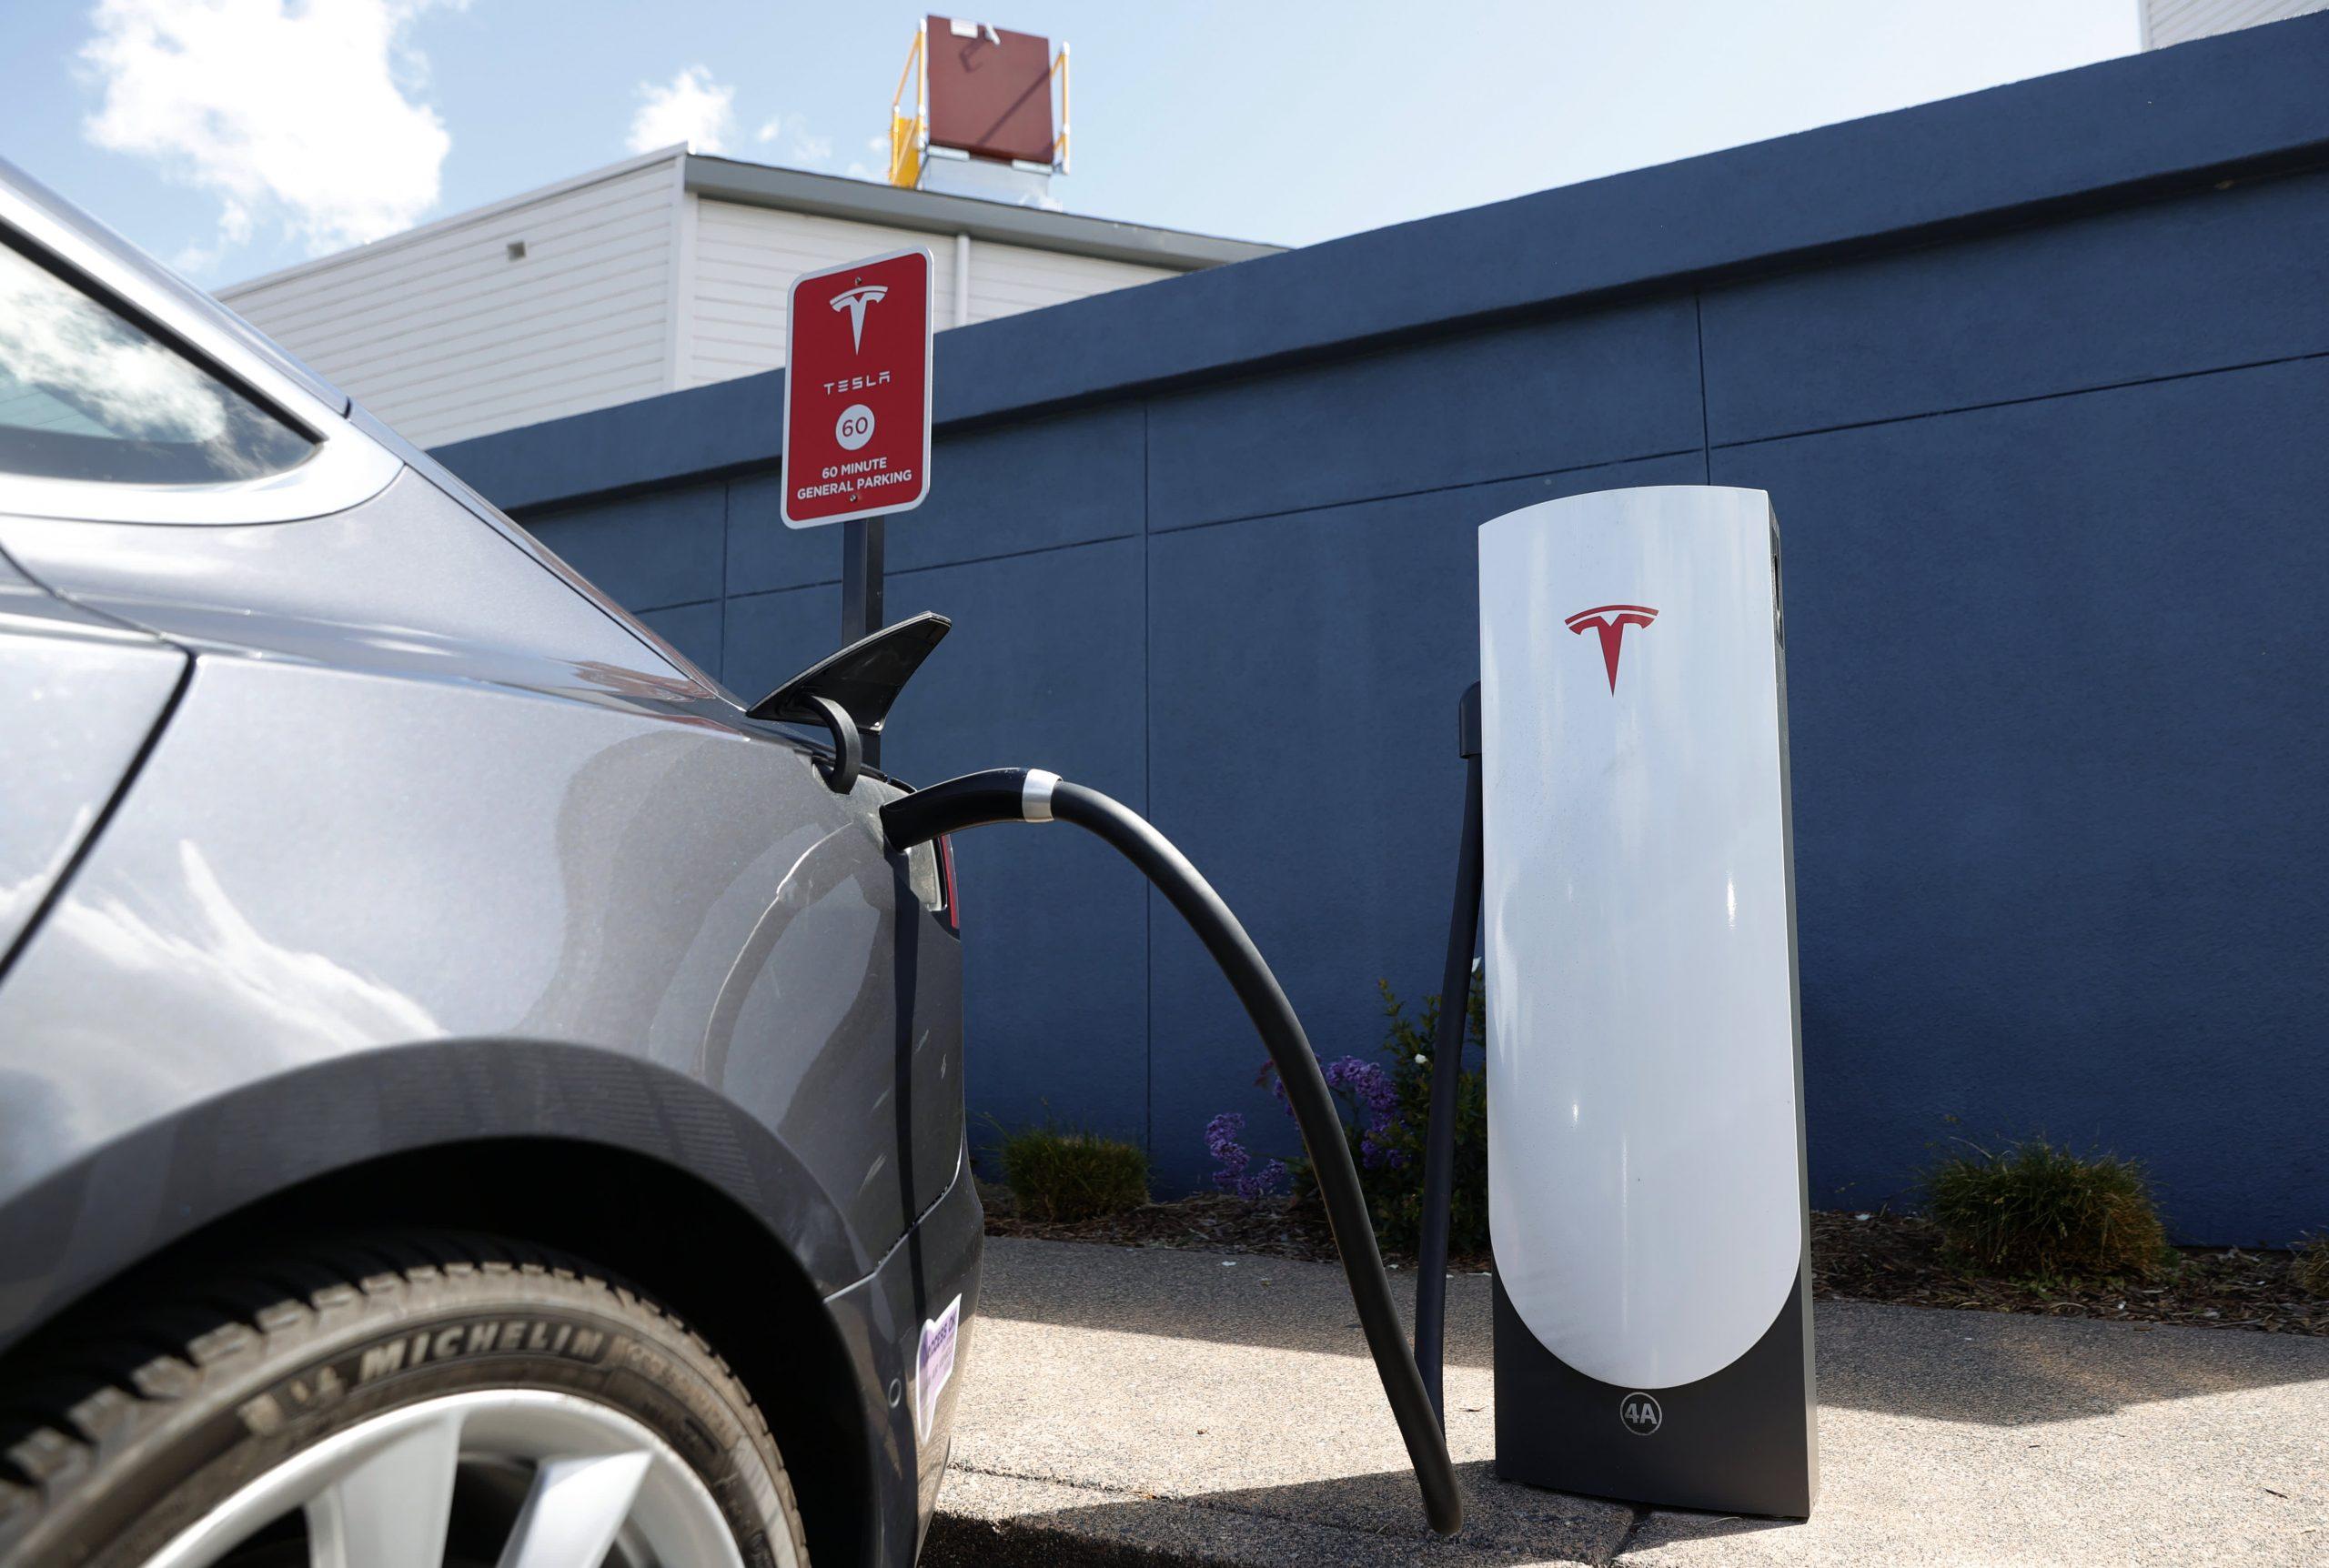 Australia miner BHP shares jump on news of nickel supply deal with Tesla EVs